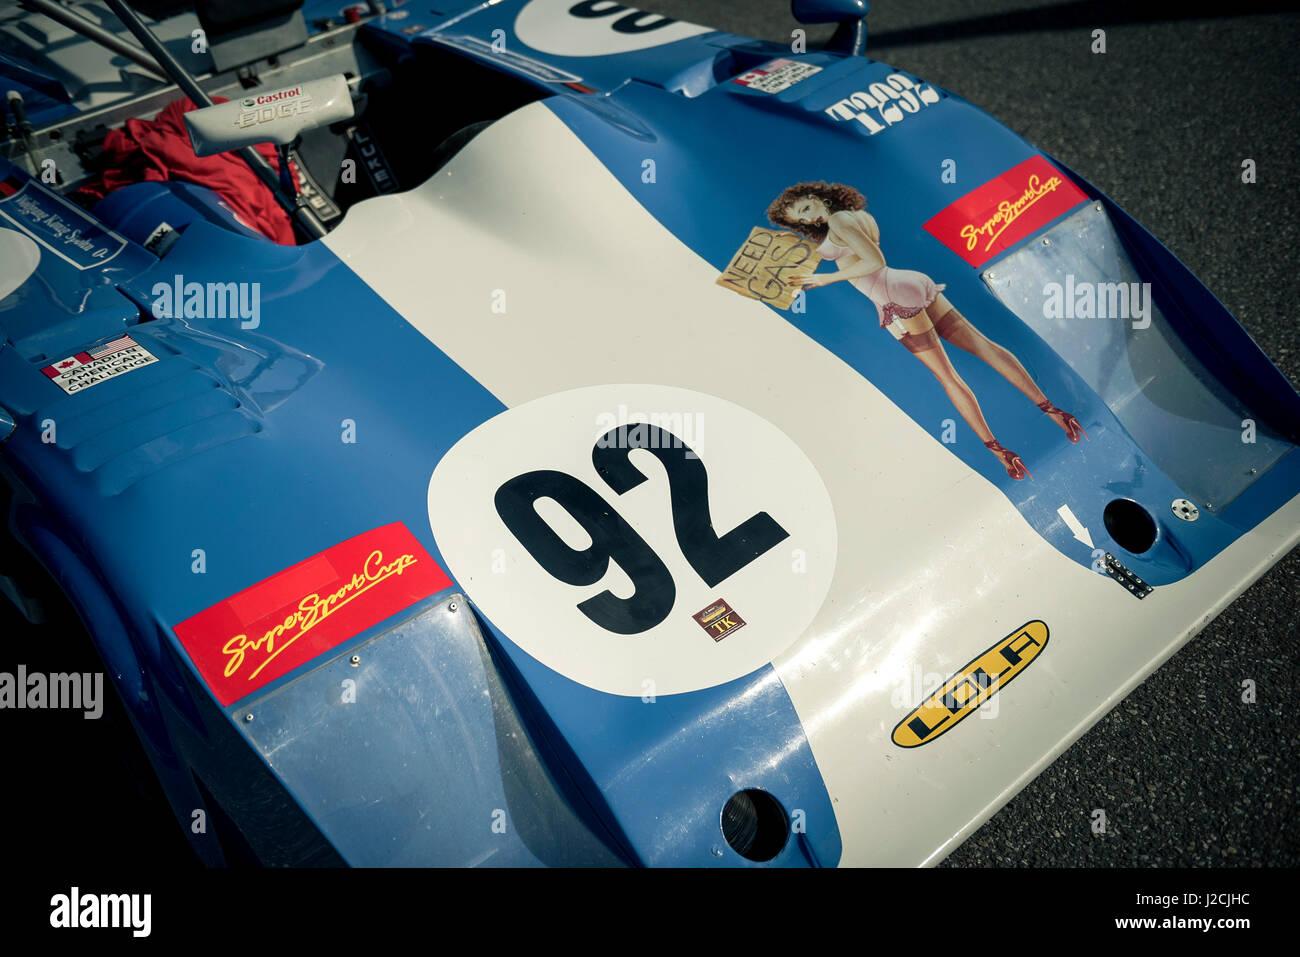 Lola Cars Stock Photos & Lola Cars Stock Images - Alamy